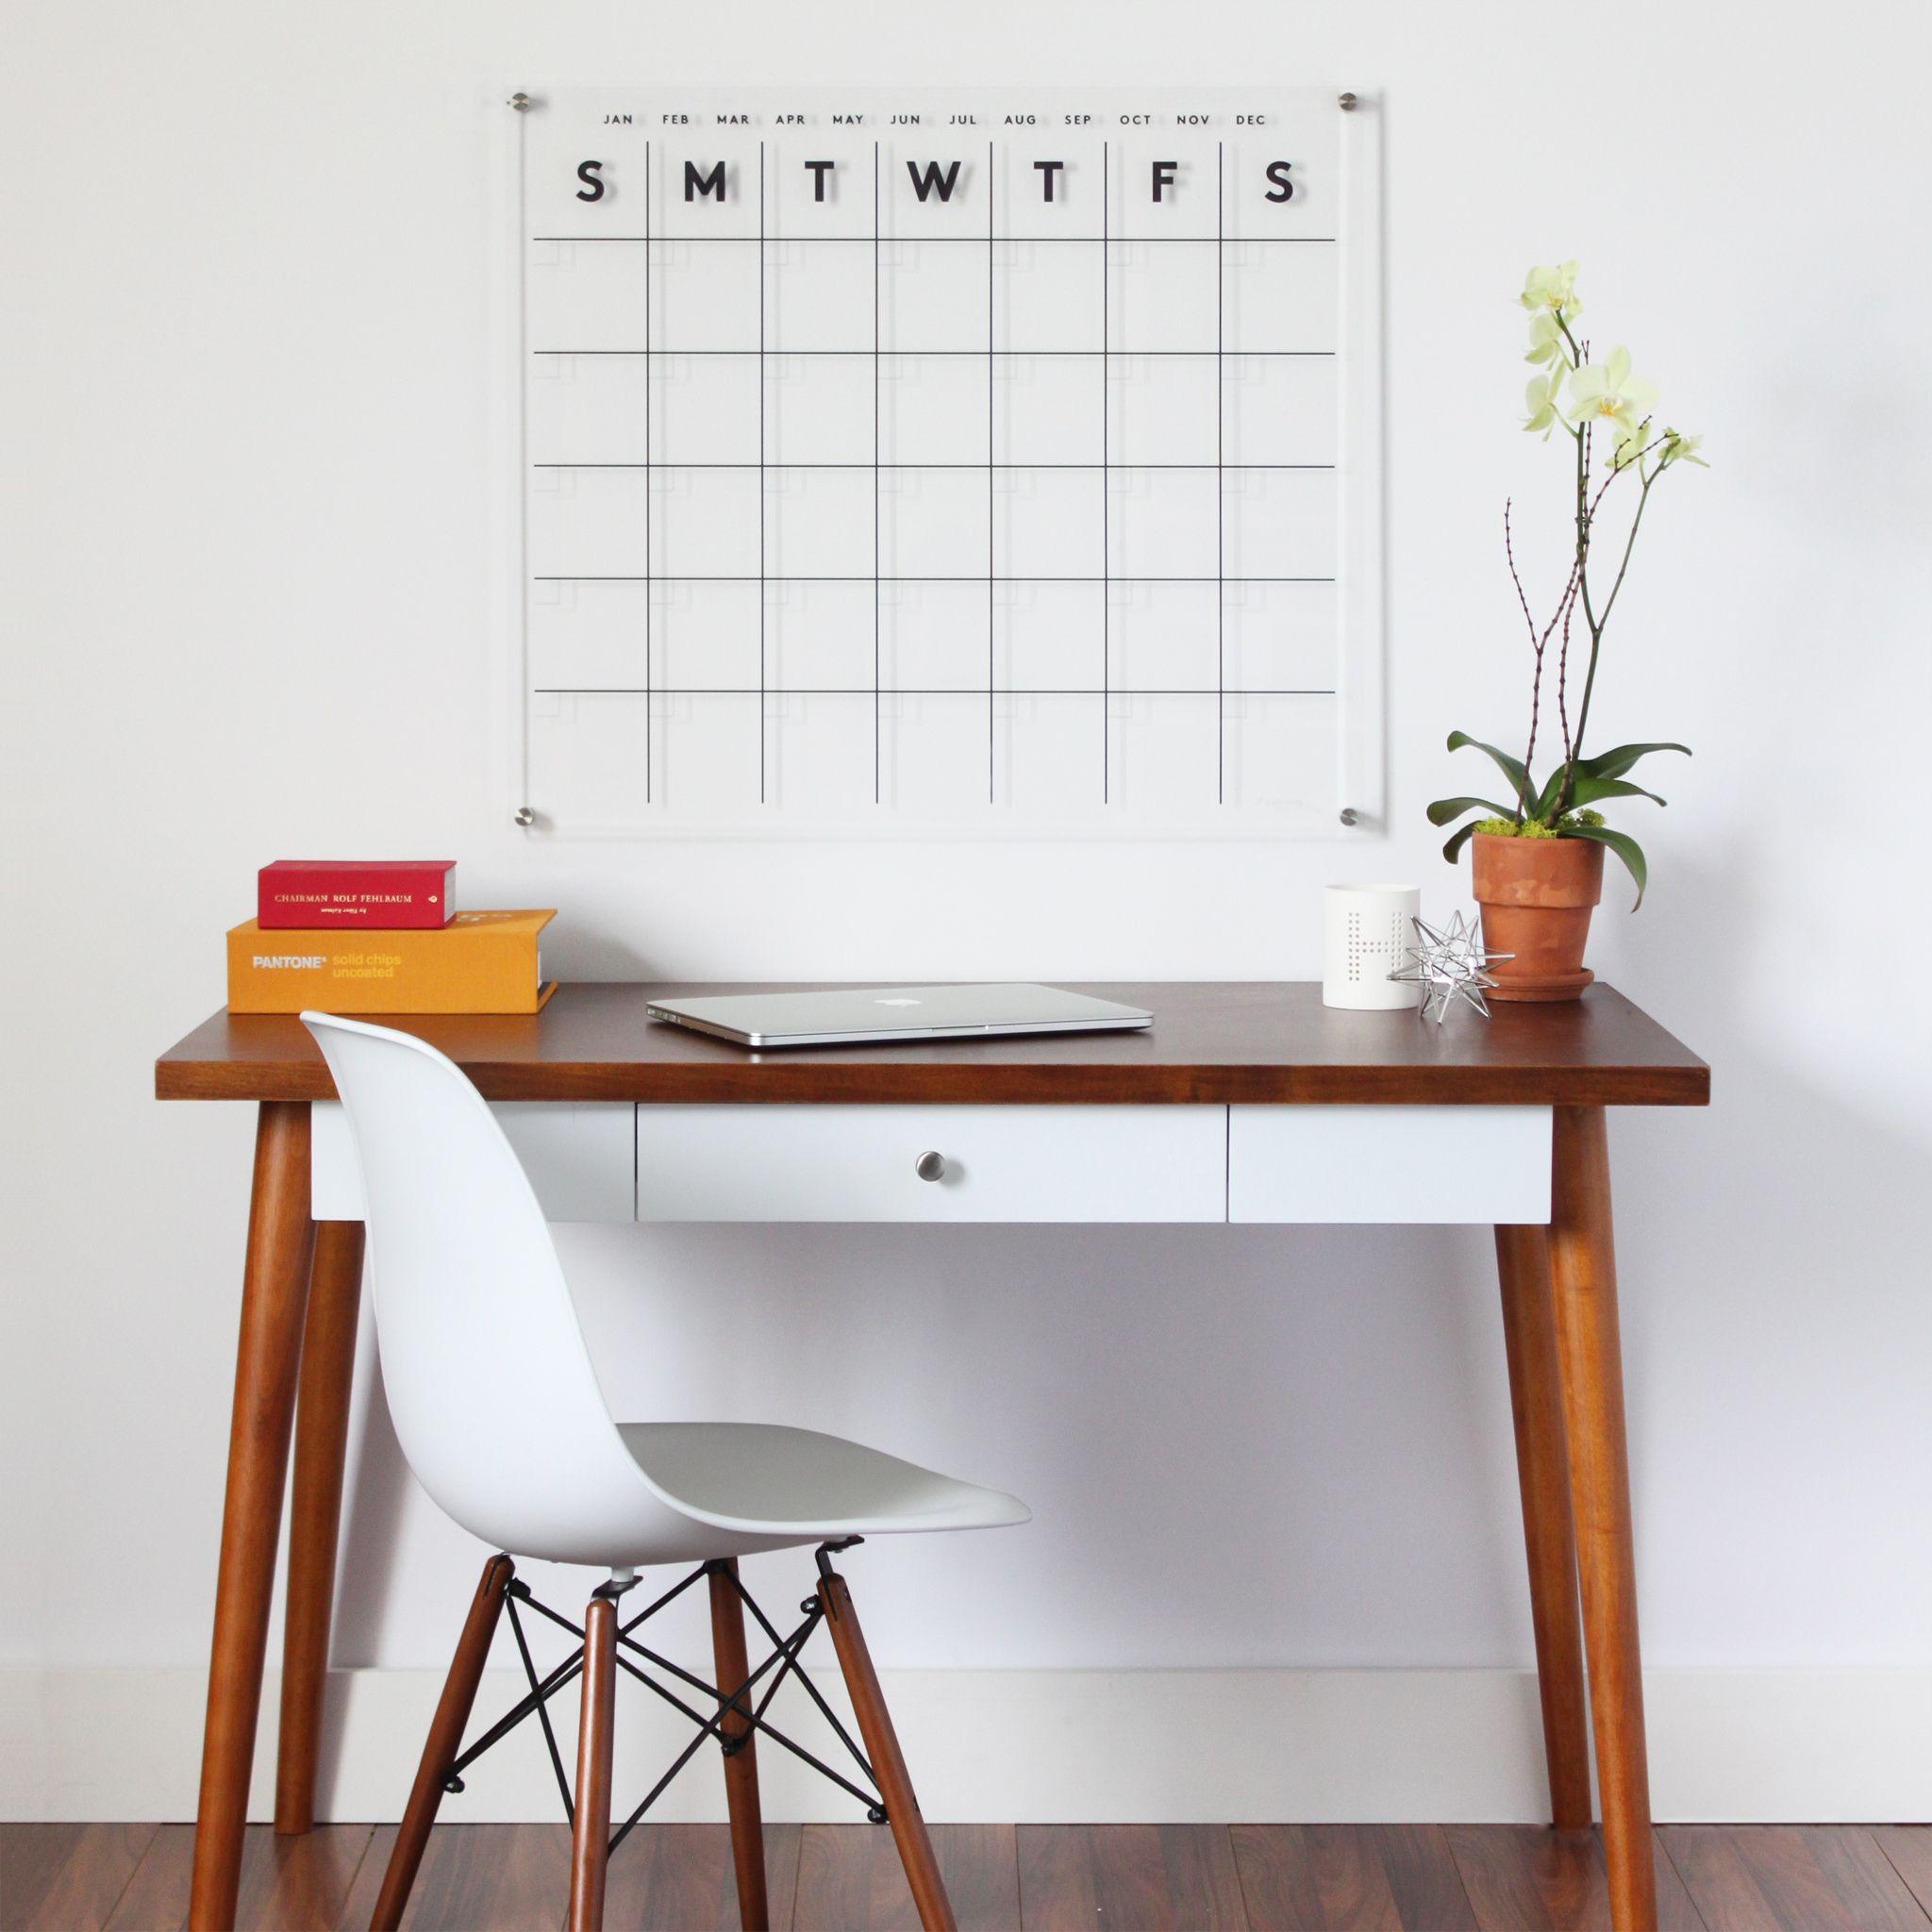 Clear Acrylic Dry Erase Calendars. Crisp, Clean, Sleek And